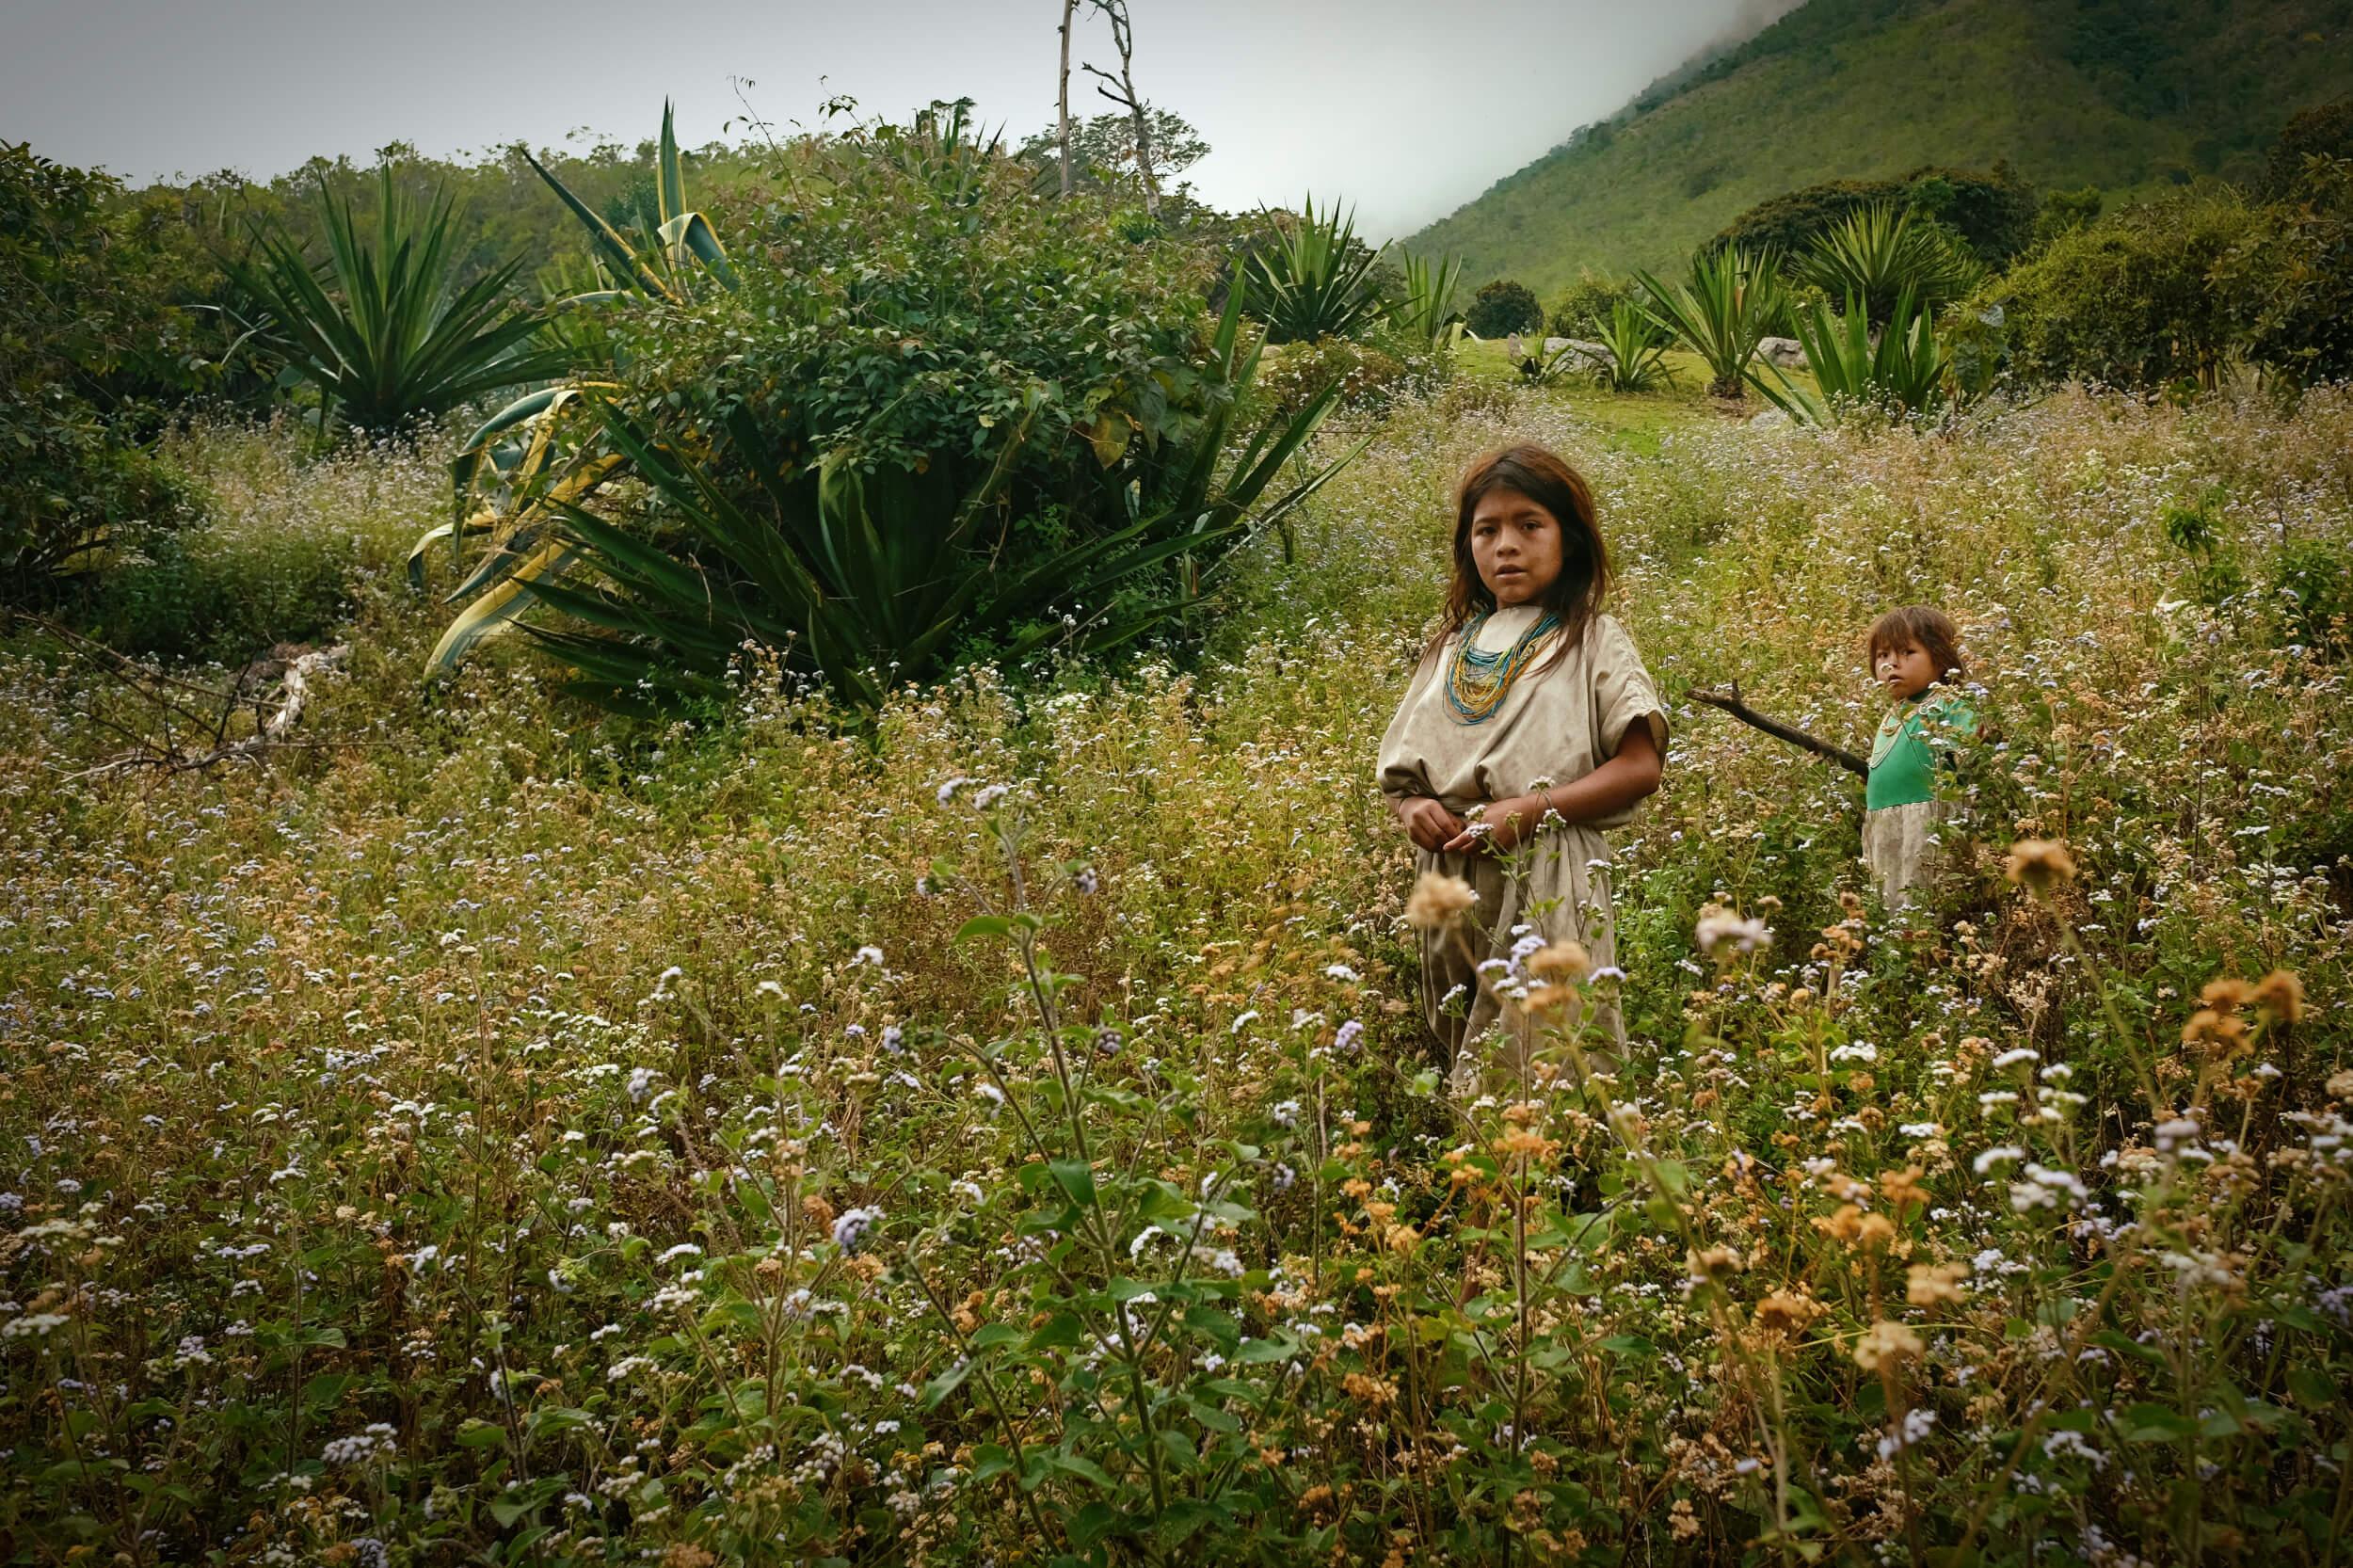 arhuaco children in a meadow of flowers